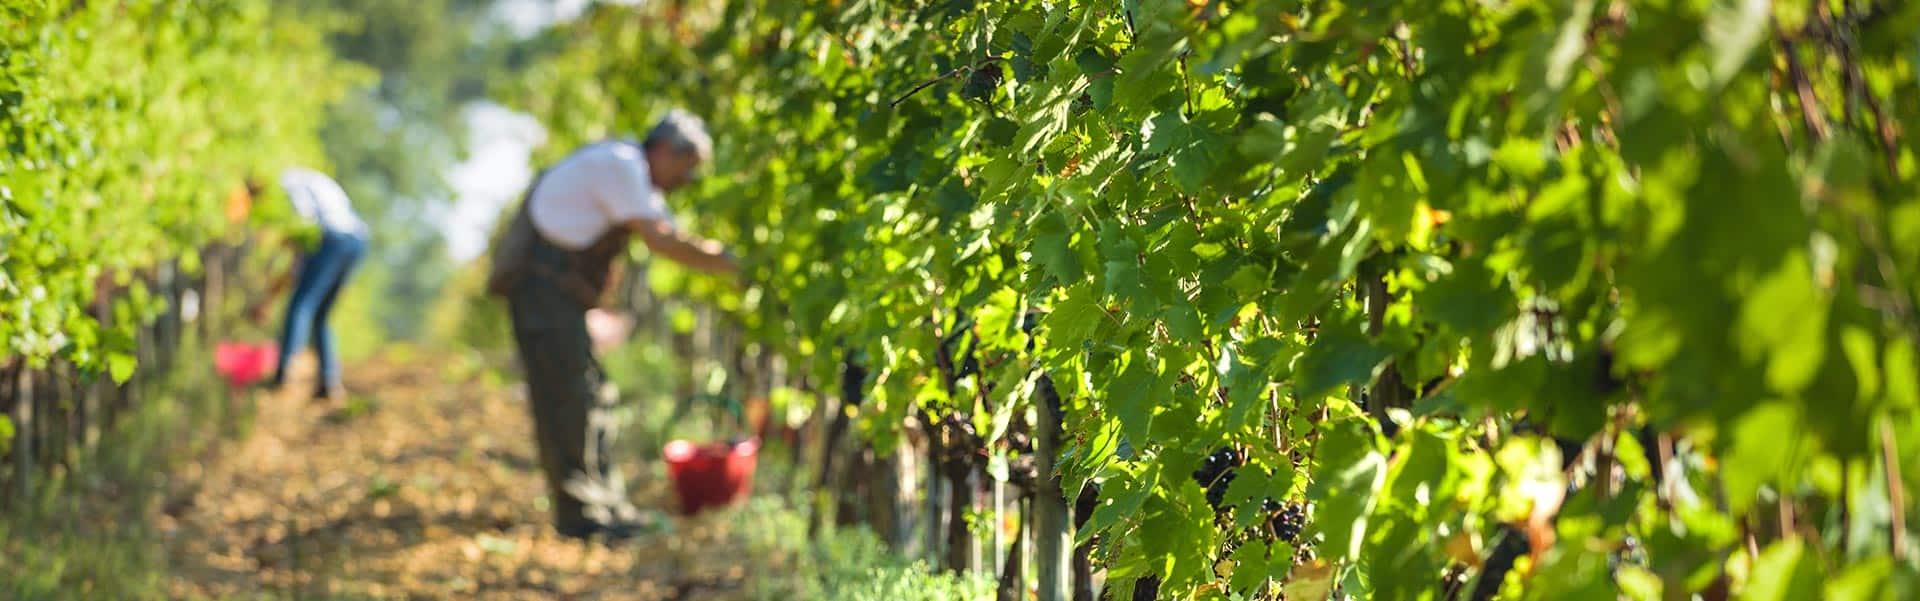 Weinkellerei Meraner Toskana Ruffini und Bolgheri